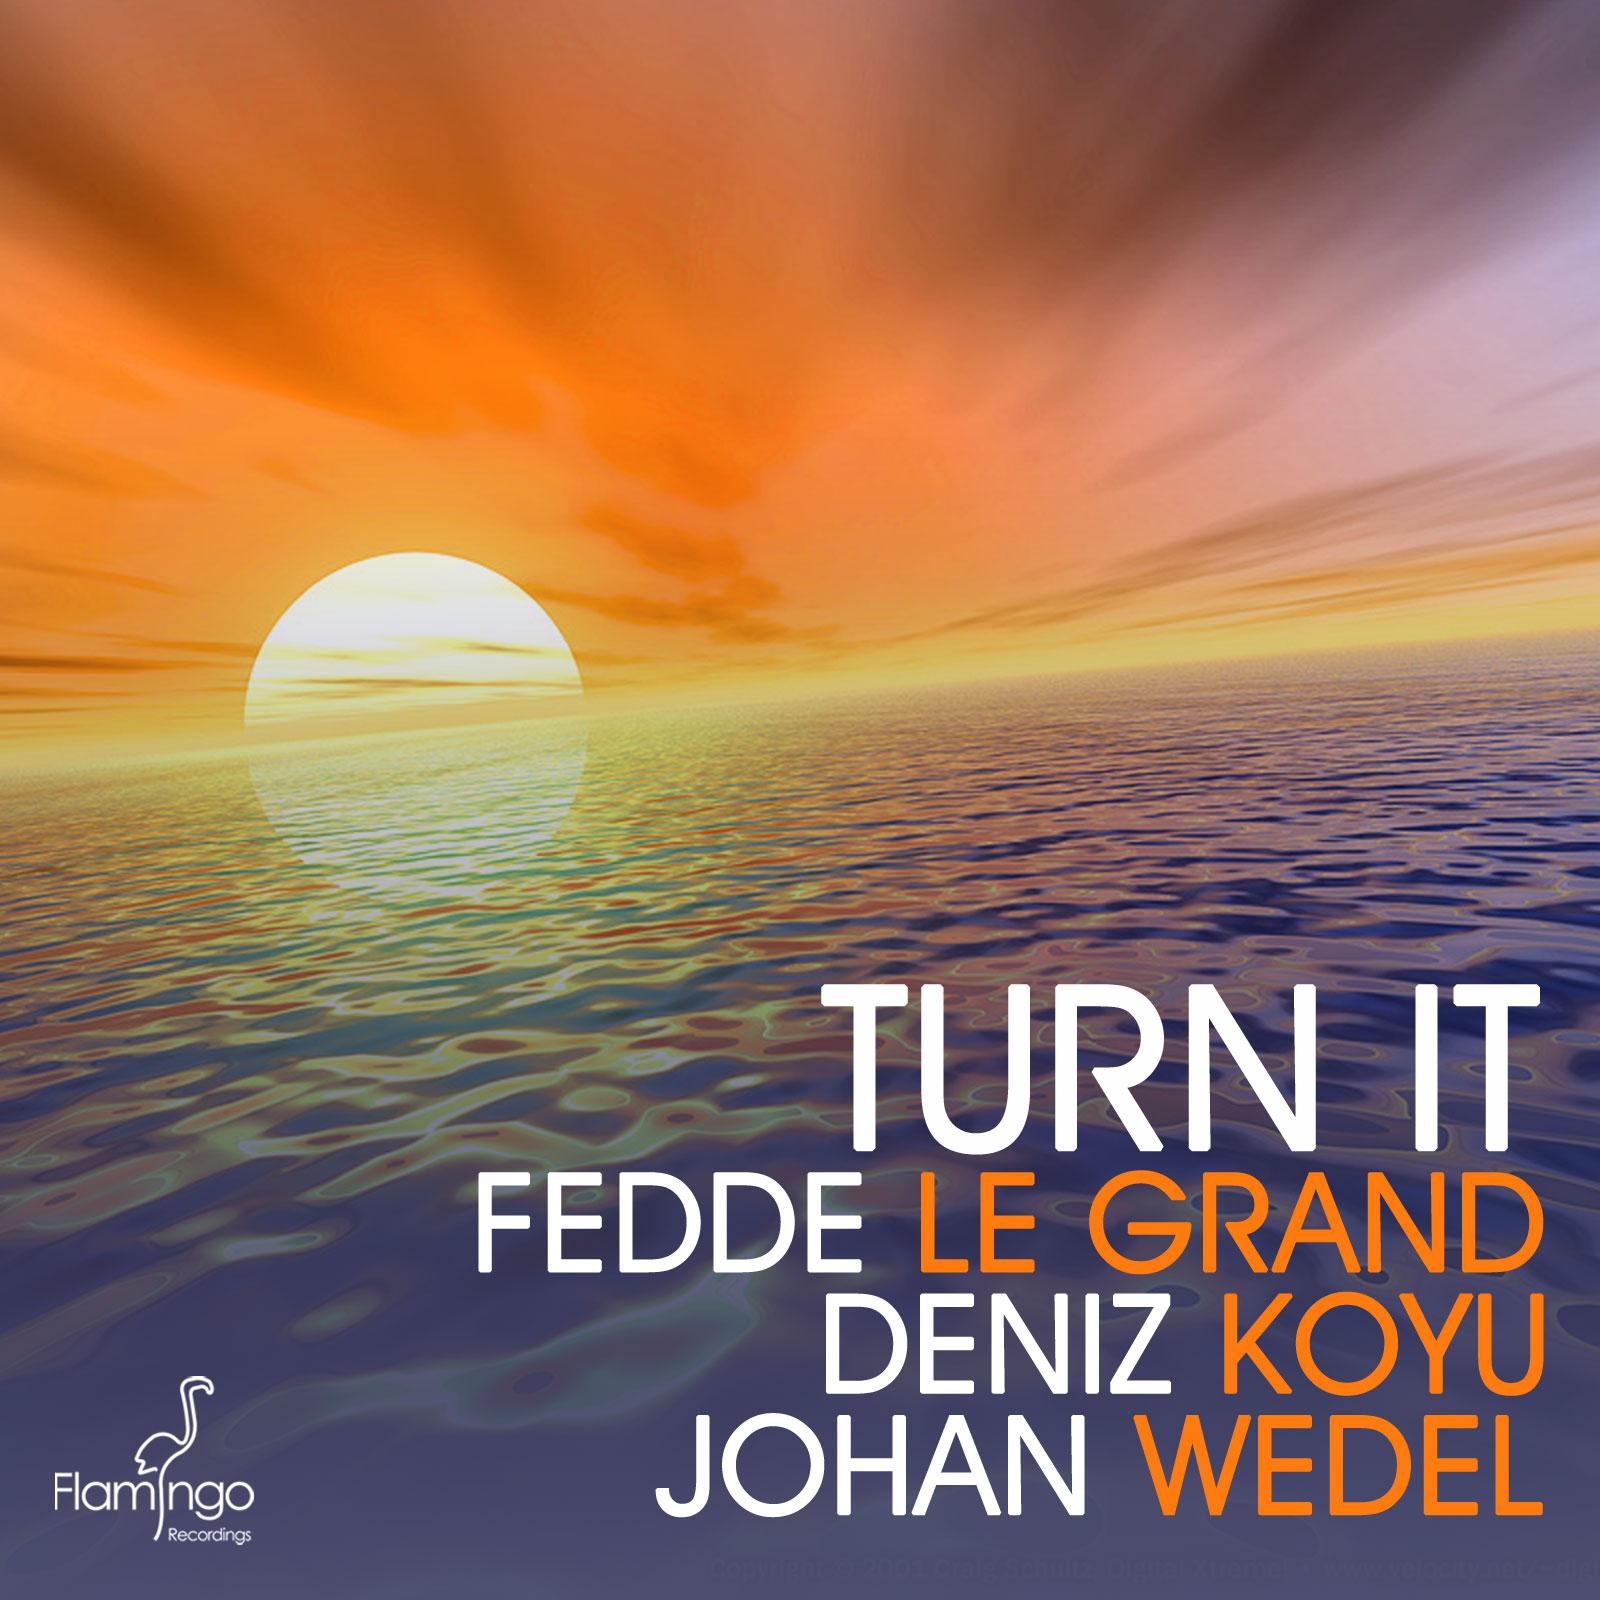 Fedde Le Grand, Deniz Koyu & Johan Wedel – Turn It (Original Mix)